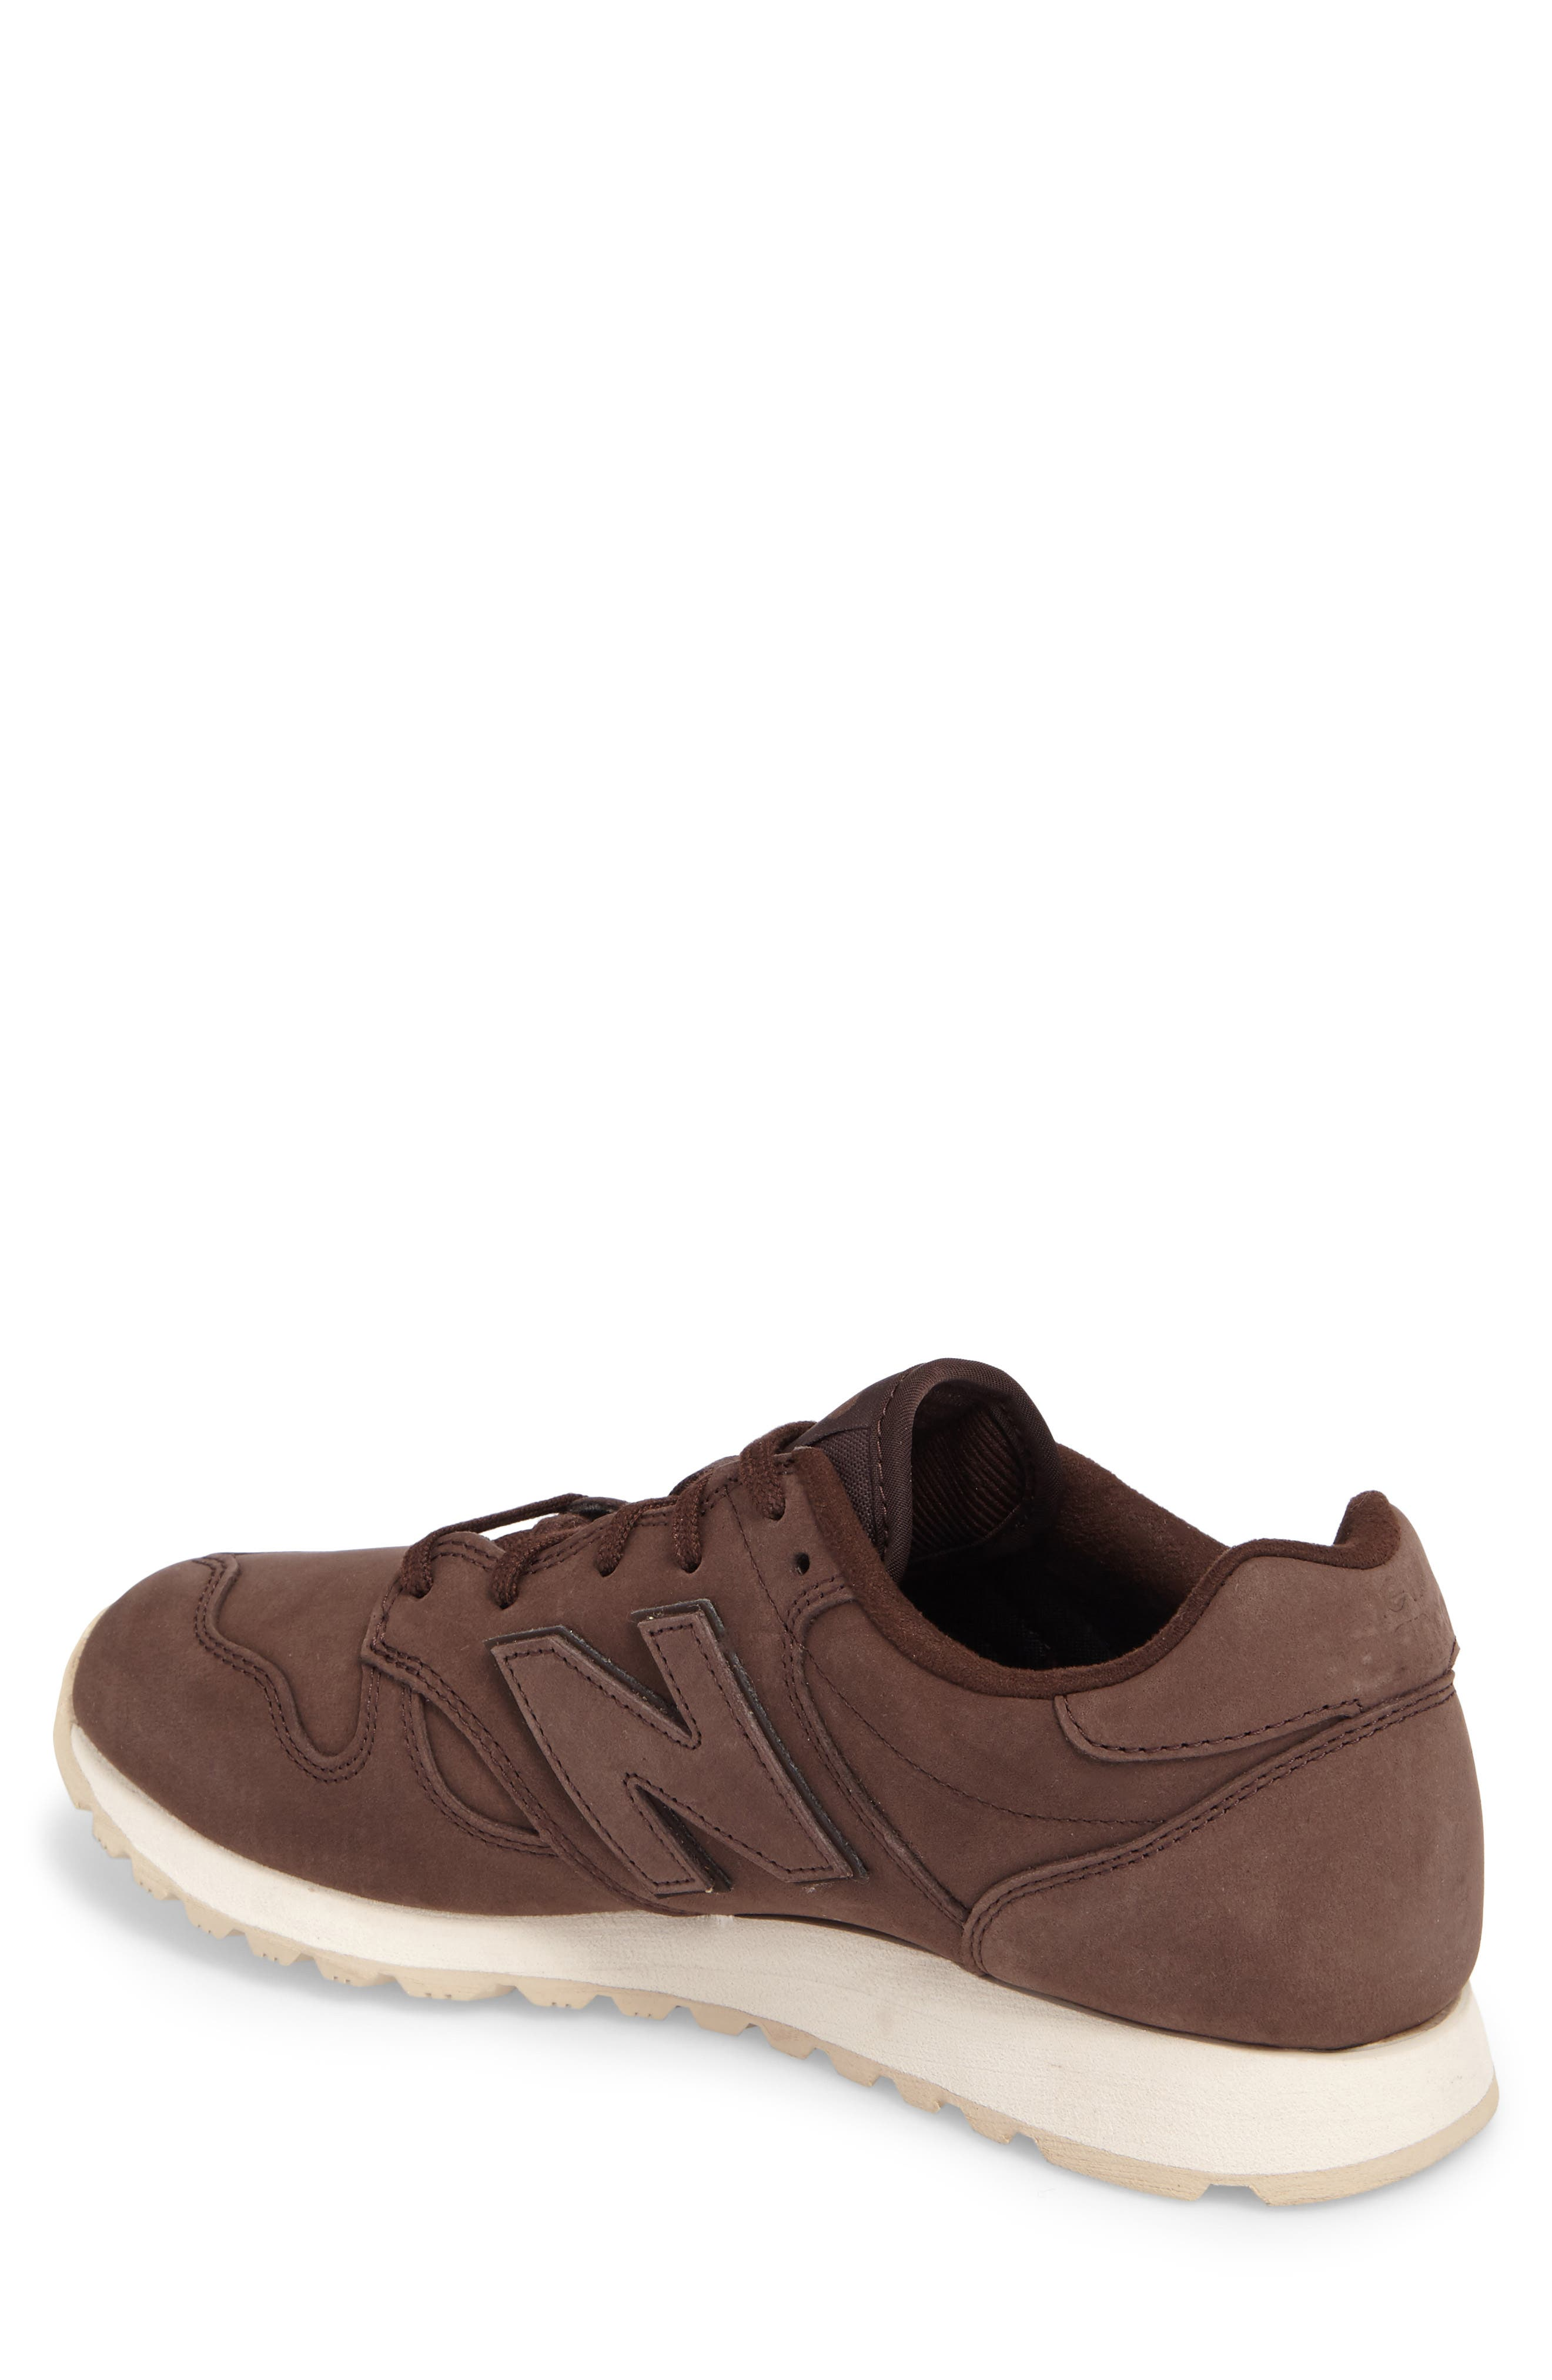 U520 Trainer Sneaker,                             Alternate thumbnail 3, color,